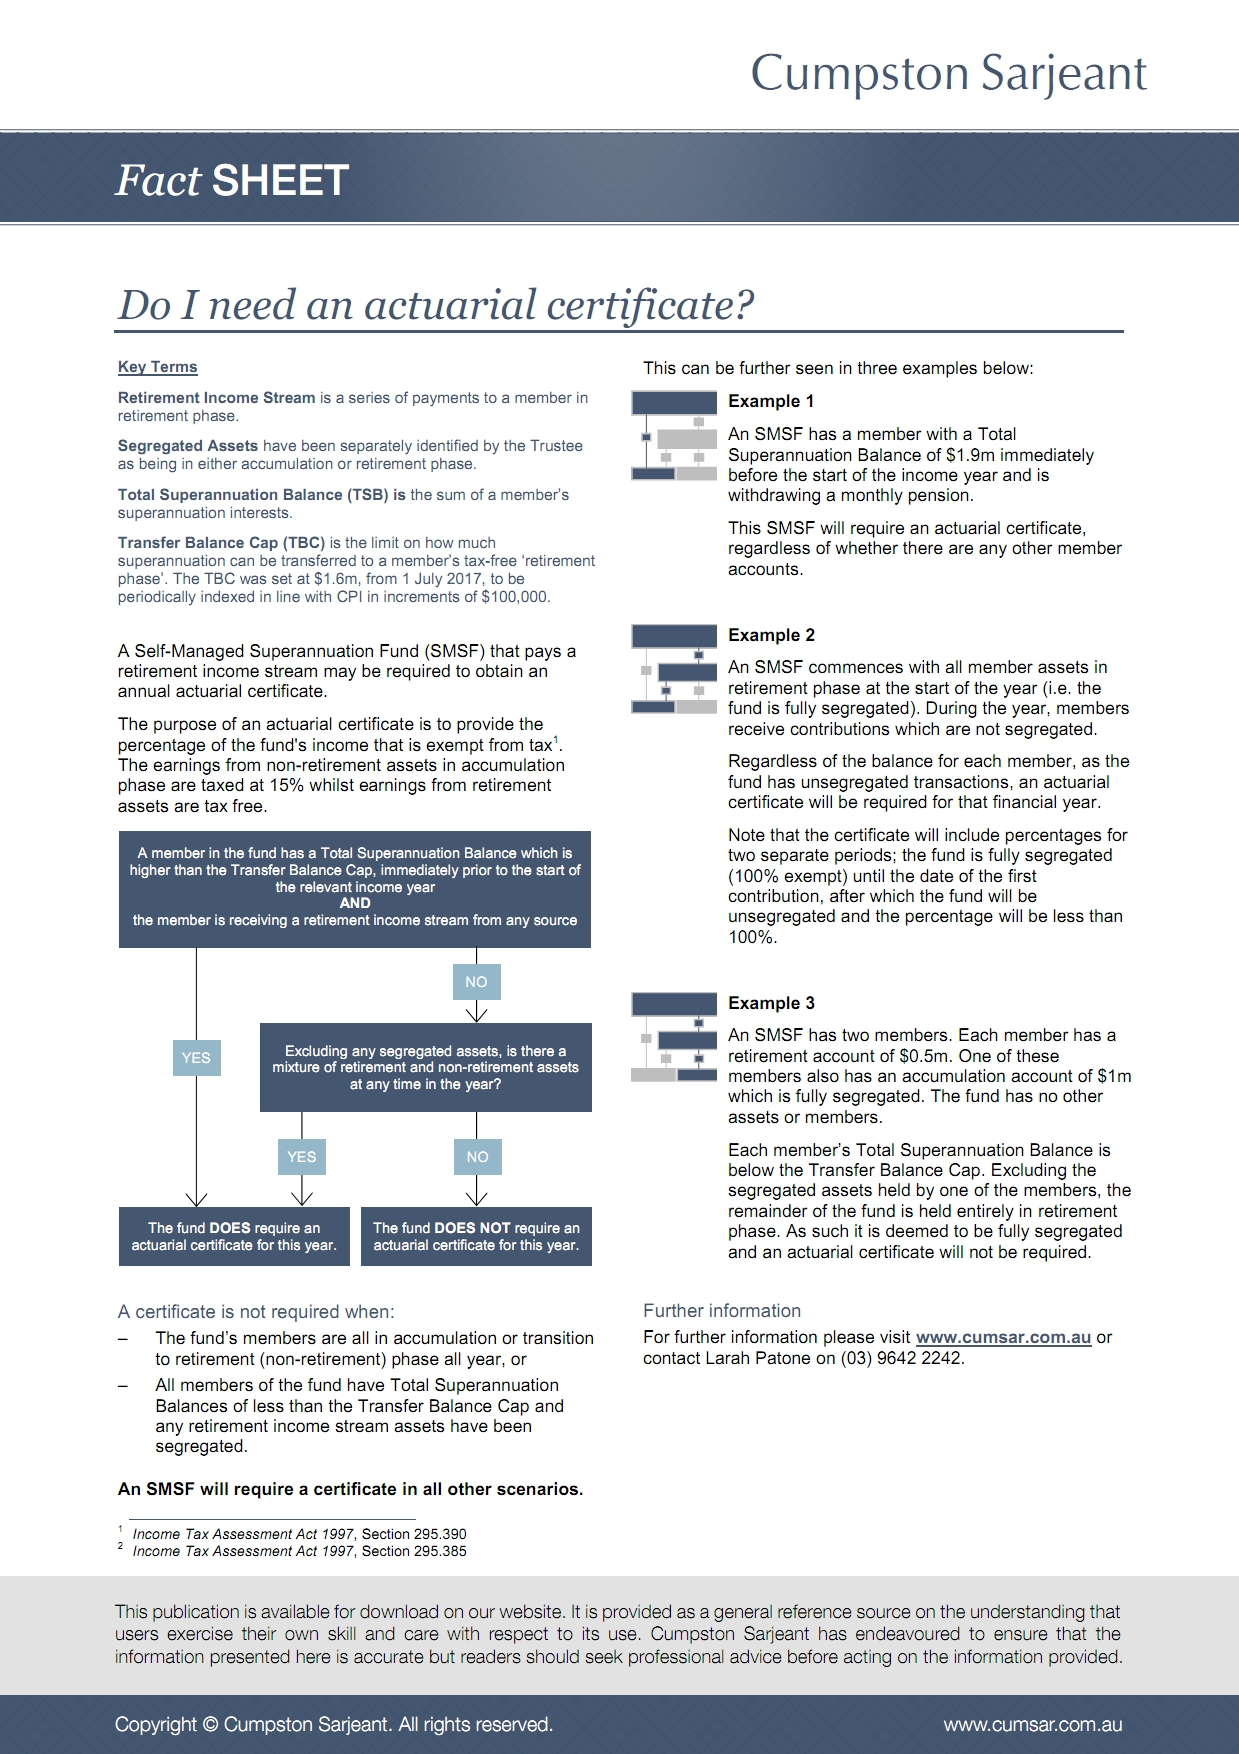 Fact Sheet: Do I need an actuarial certificate?